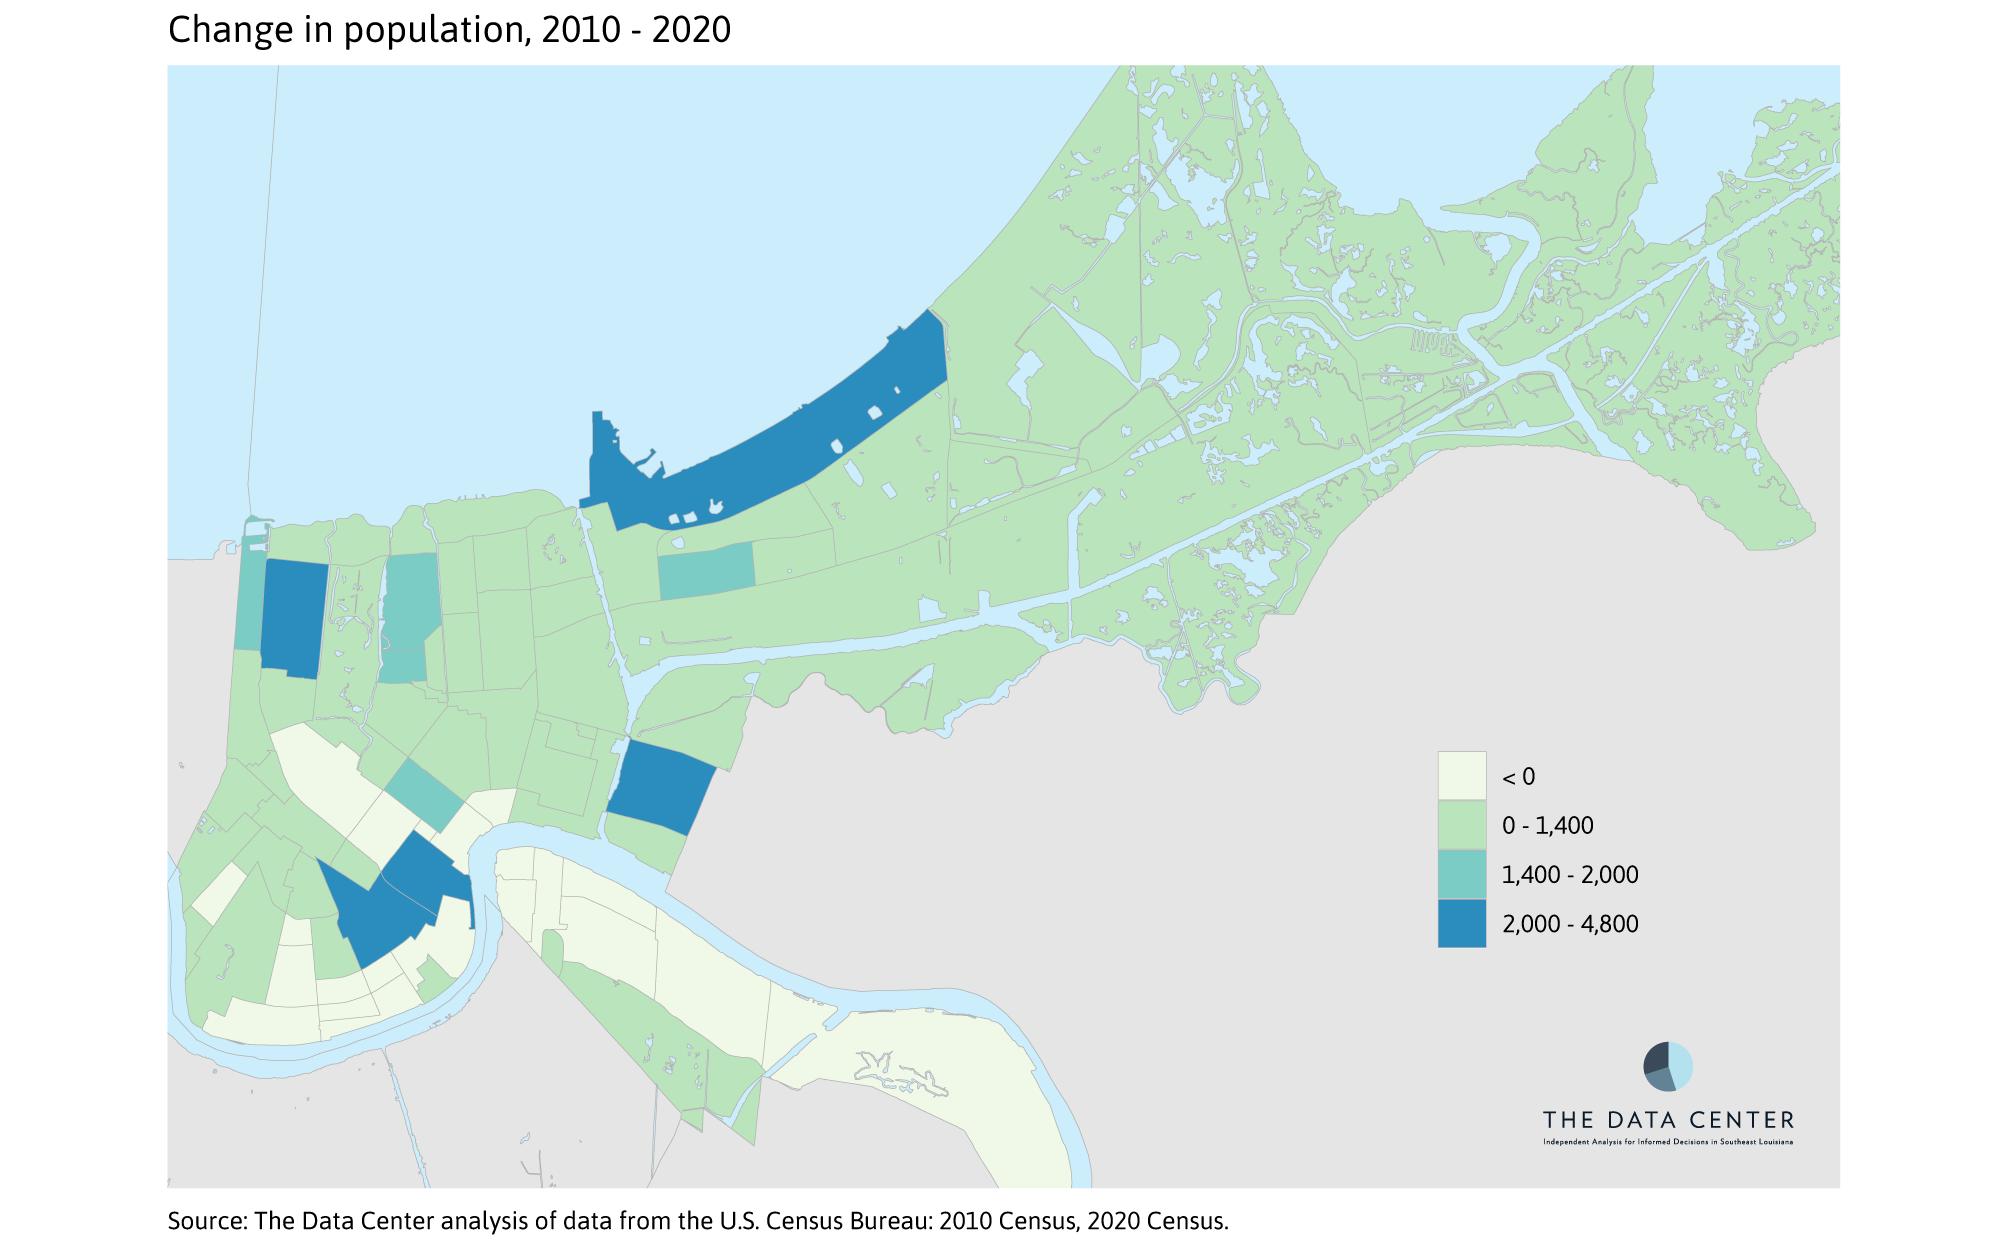 Percent Change, 2010 to 2020